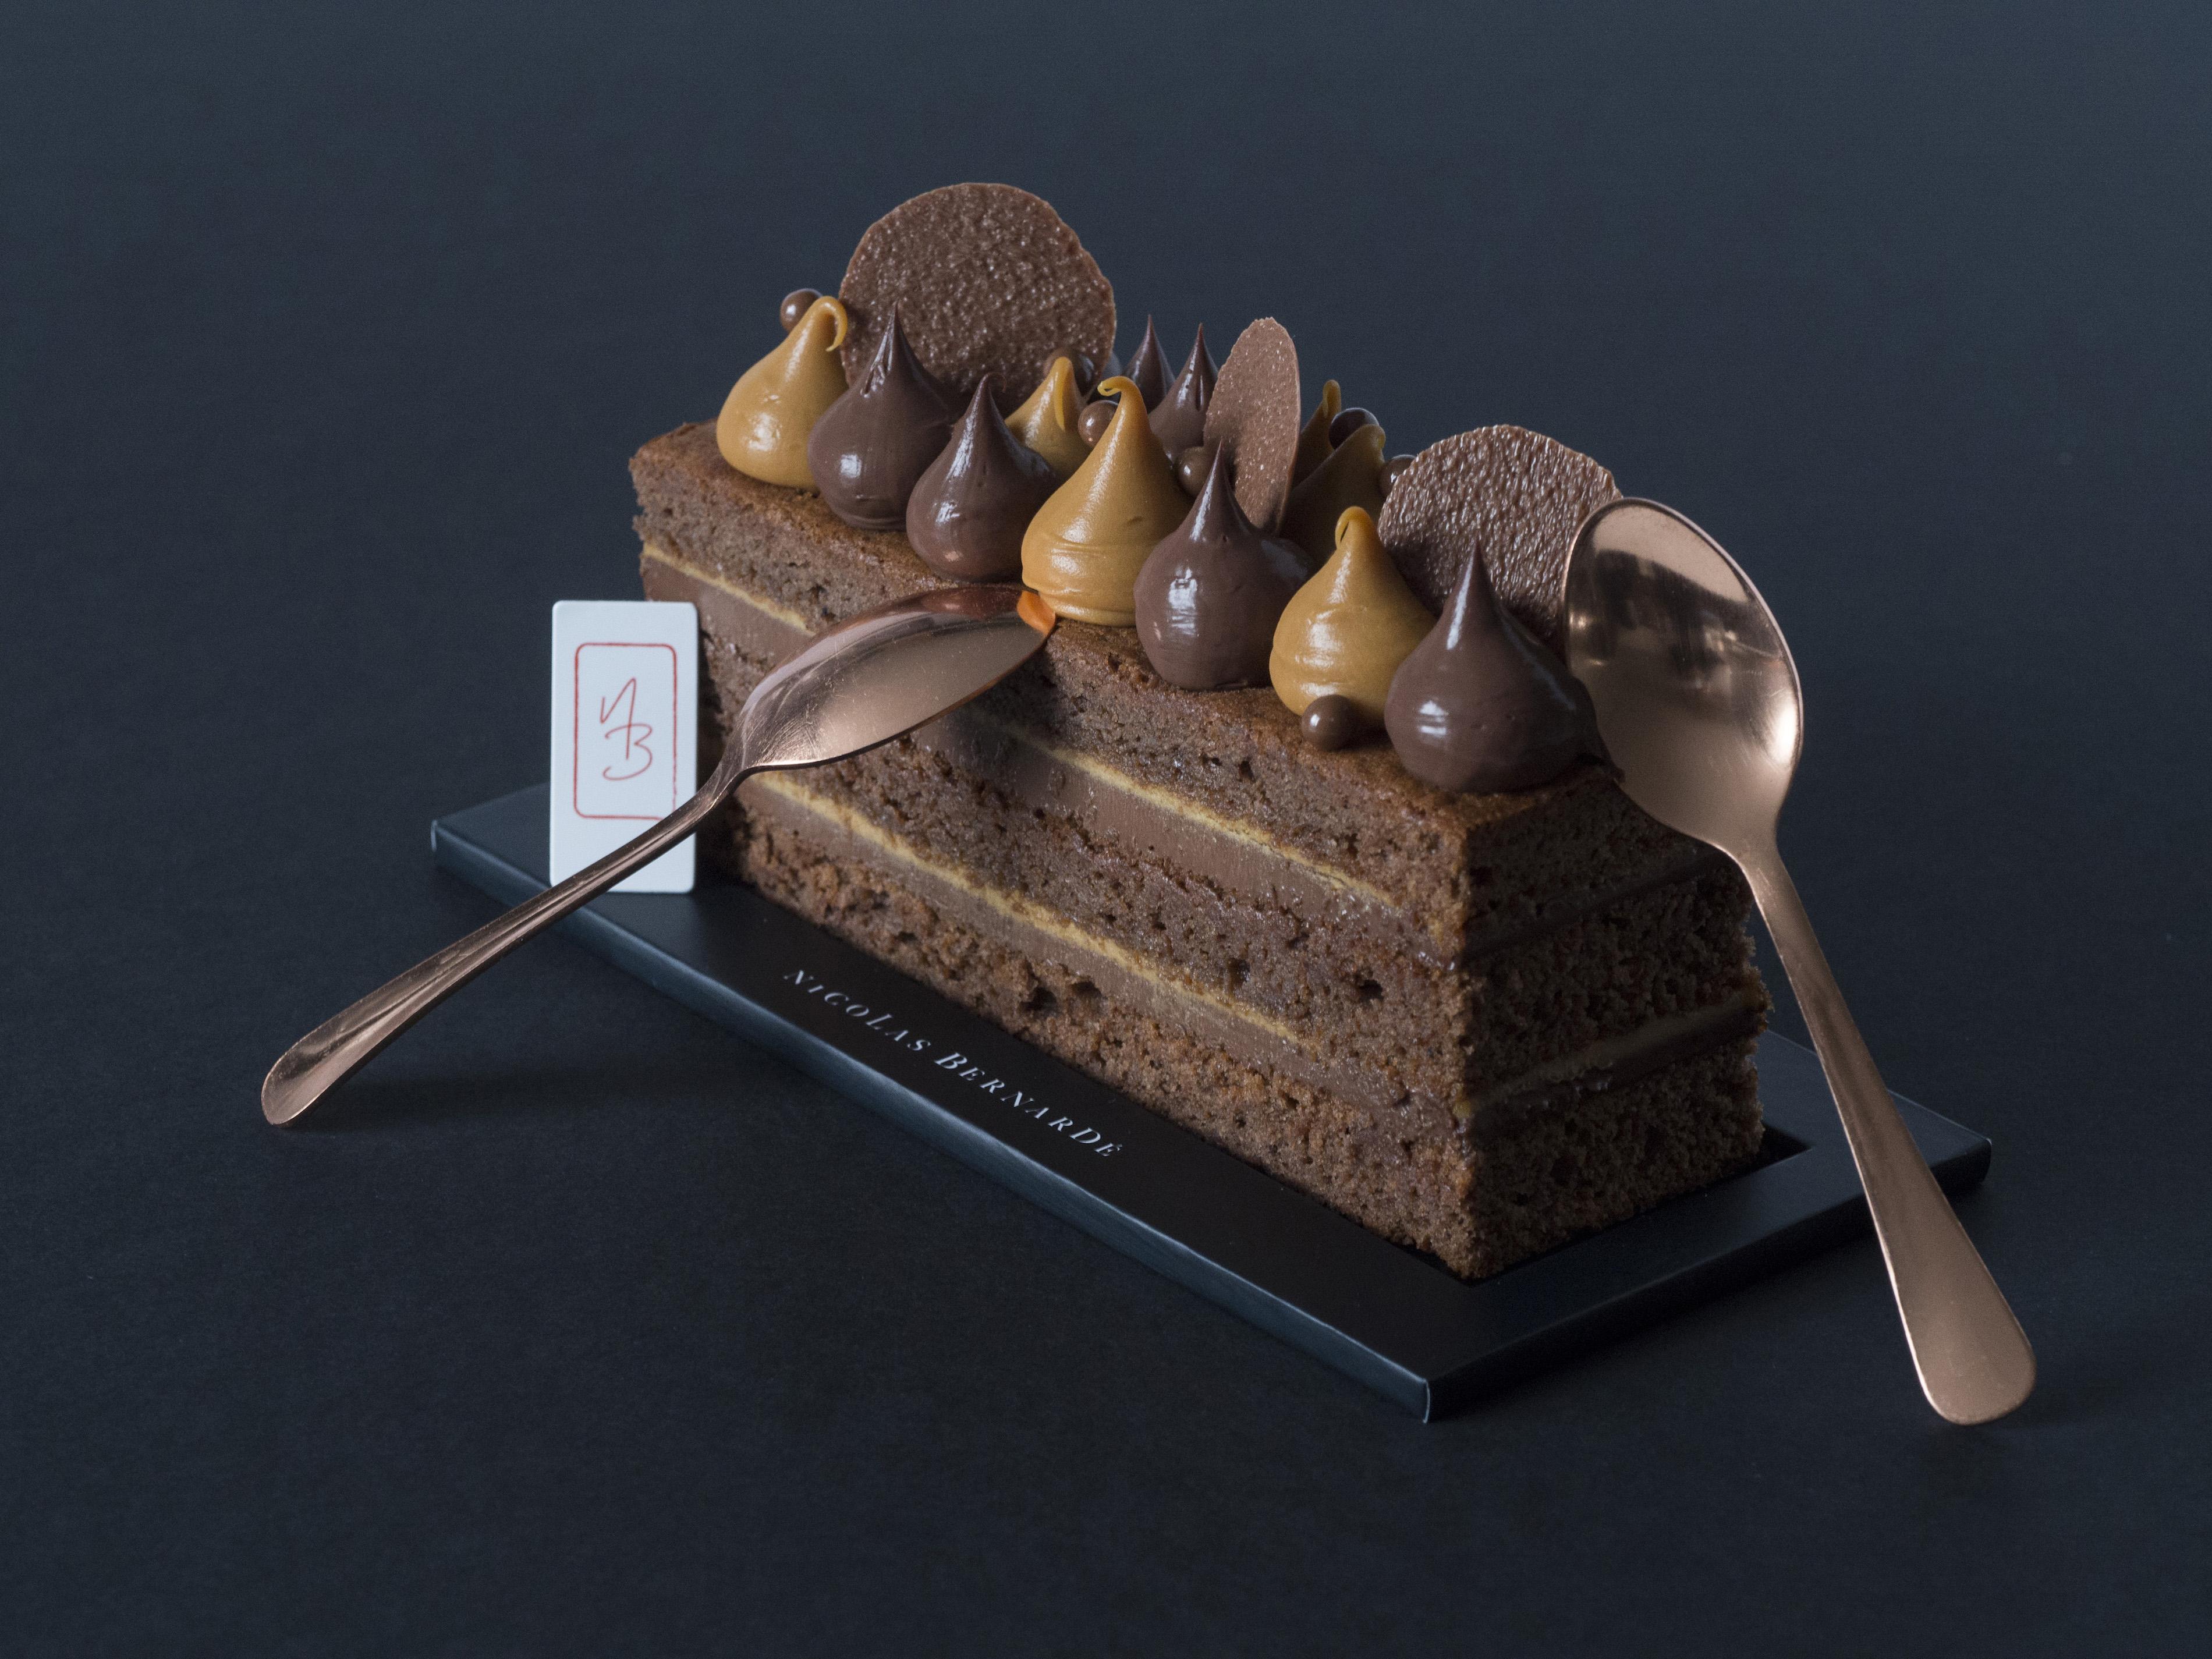 Le Cakissime Chocolat Caramel